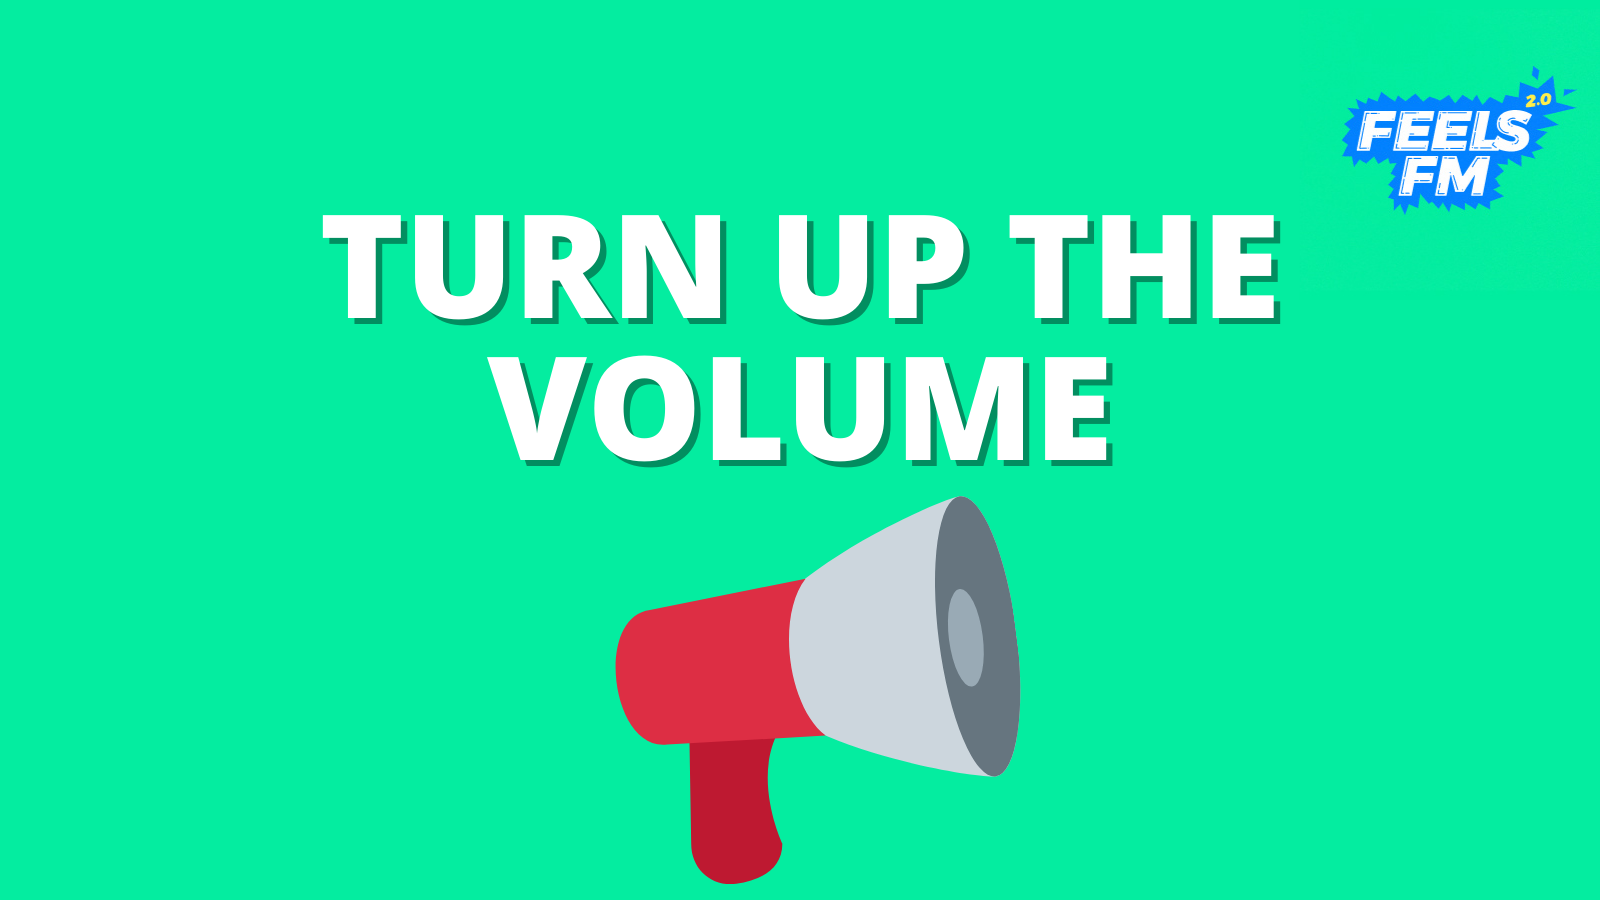 """Turn up the volume"" written above a megaphone emoji"